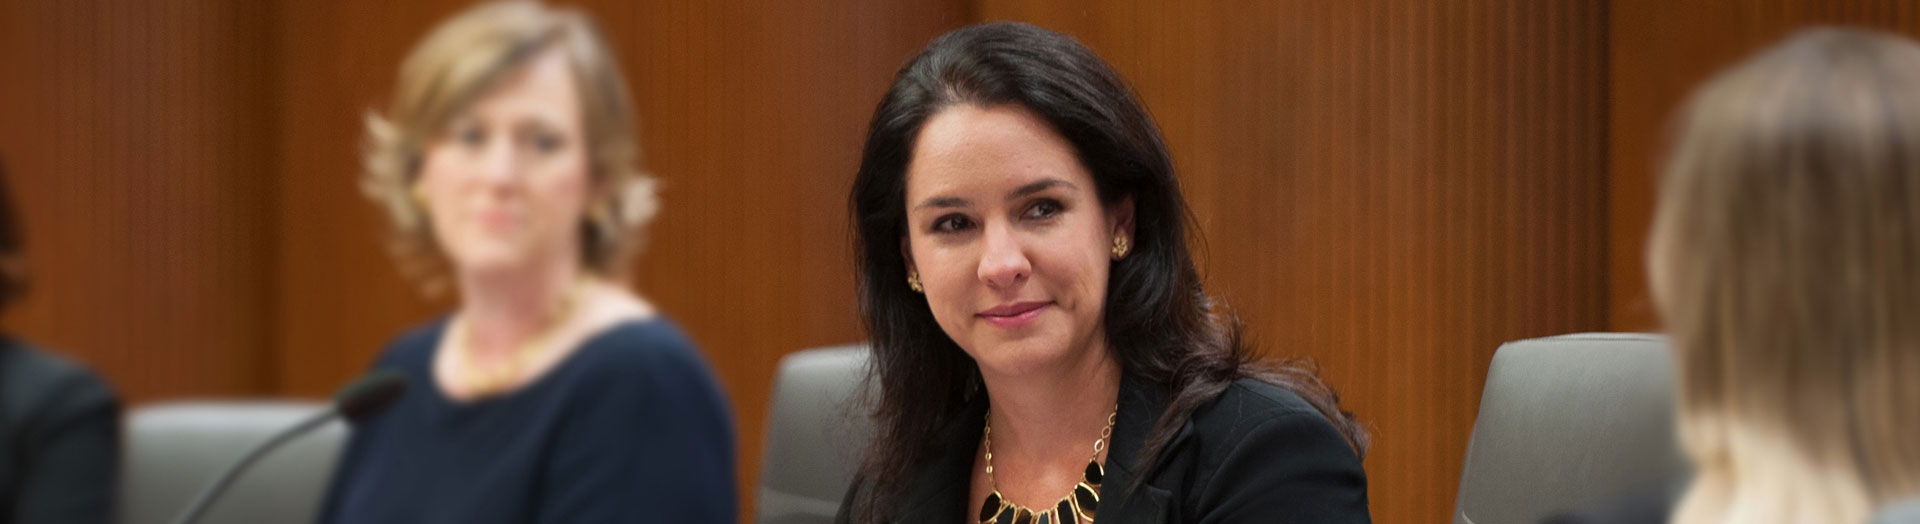 Family Law Monica Garcia Harms